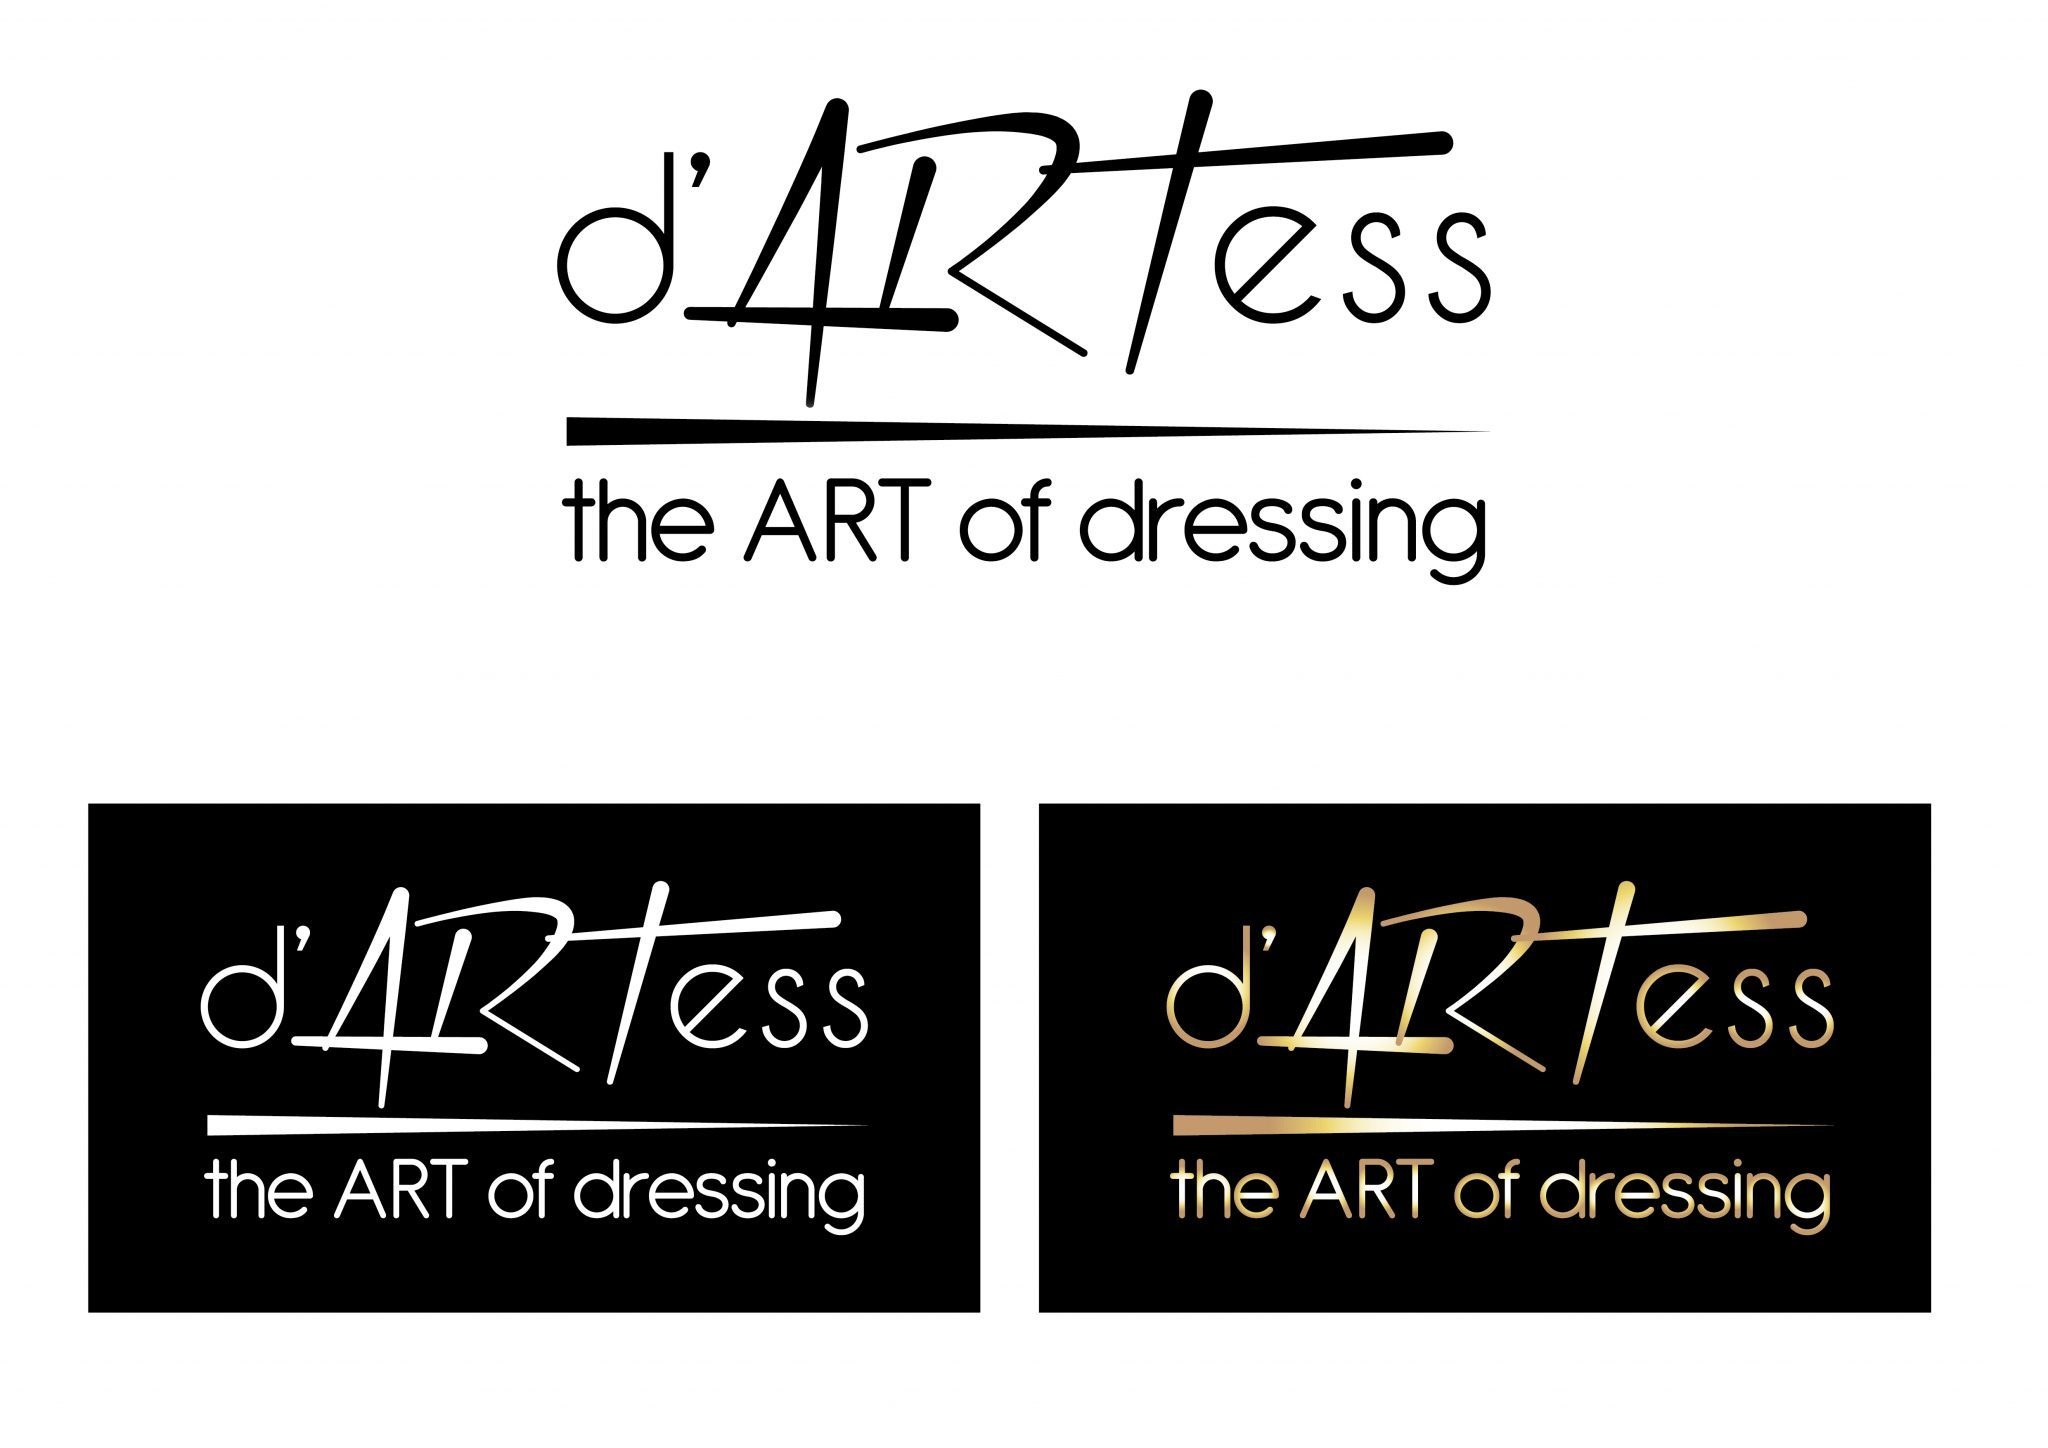 Grafichen dizain - Dartess logo